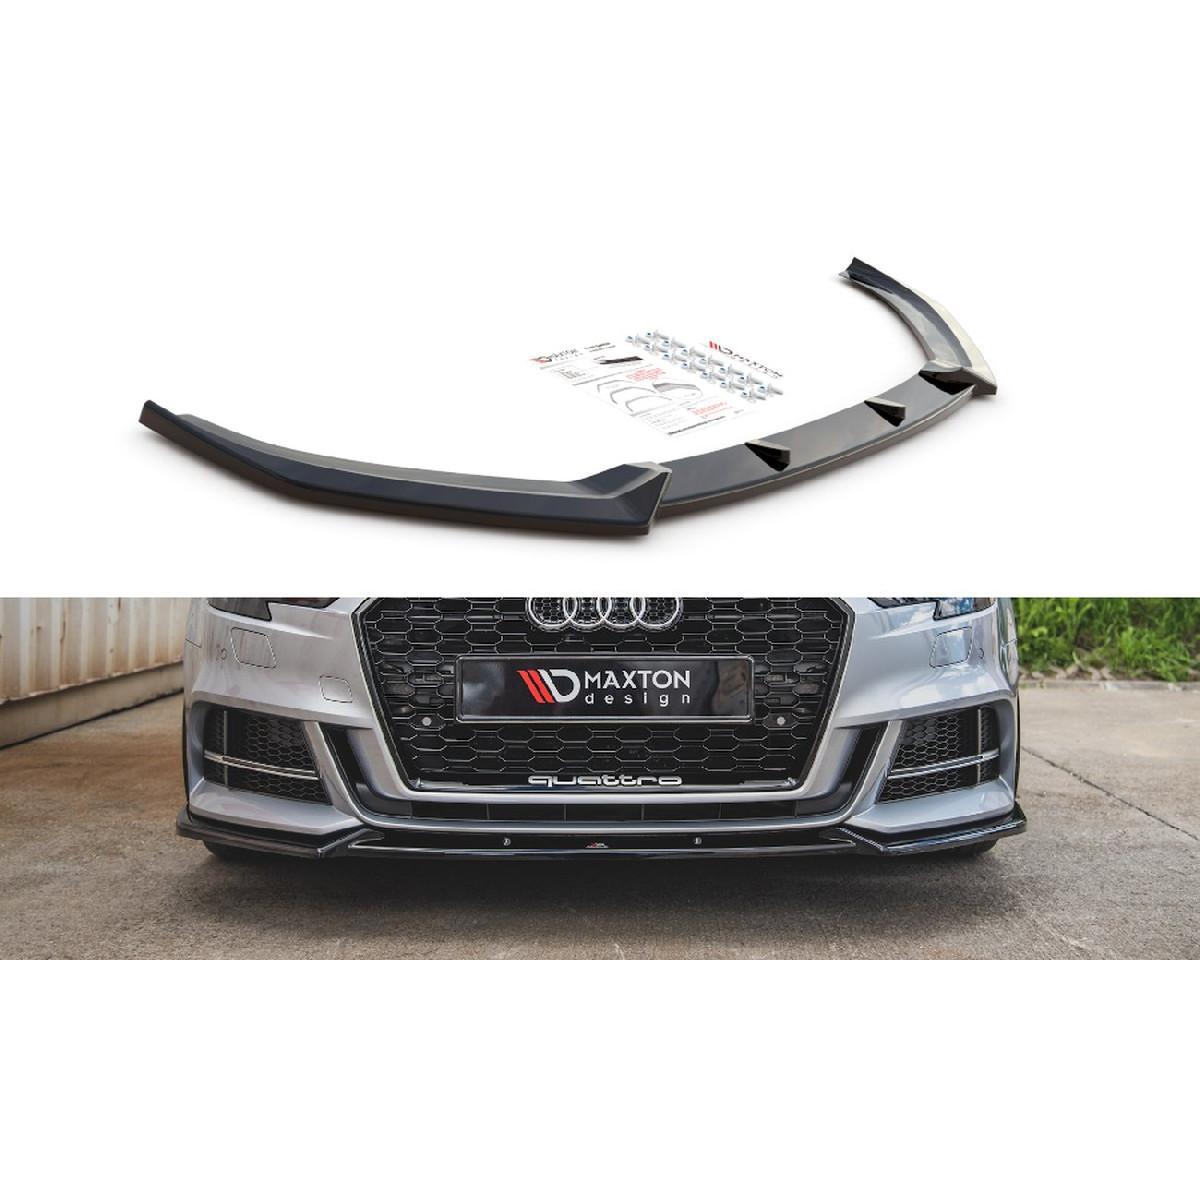 Cup Spoilerlippe Front Ansatz V.3 für Audi S3 / A3 S-Line 8V Facelift schwarz matt